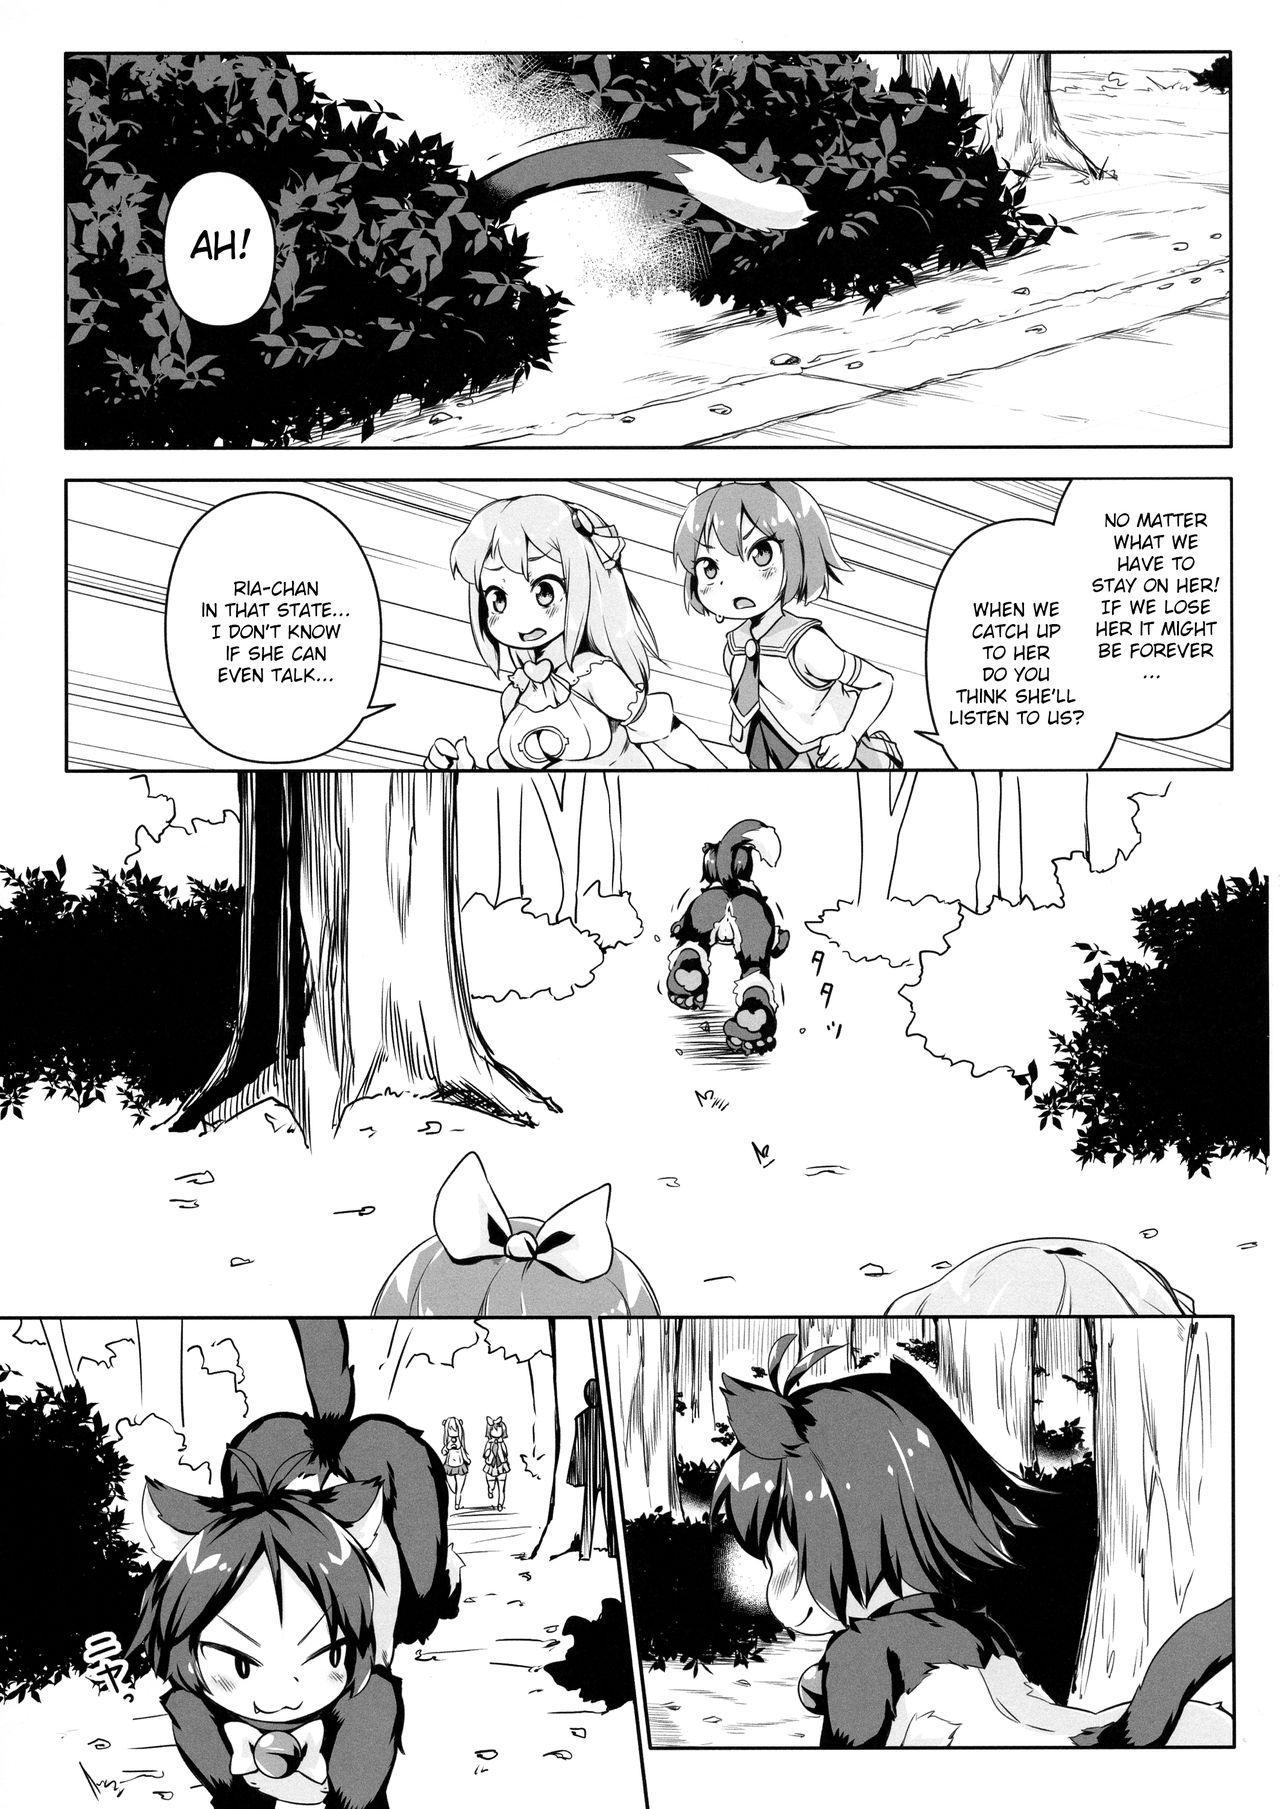 Neko Ochi Shine Fairies | The Cat Fall of the Shine Fairies 8